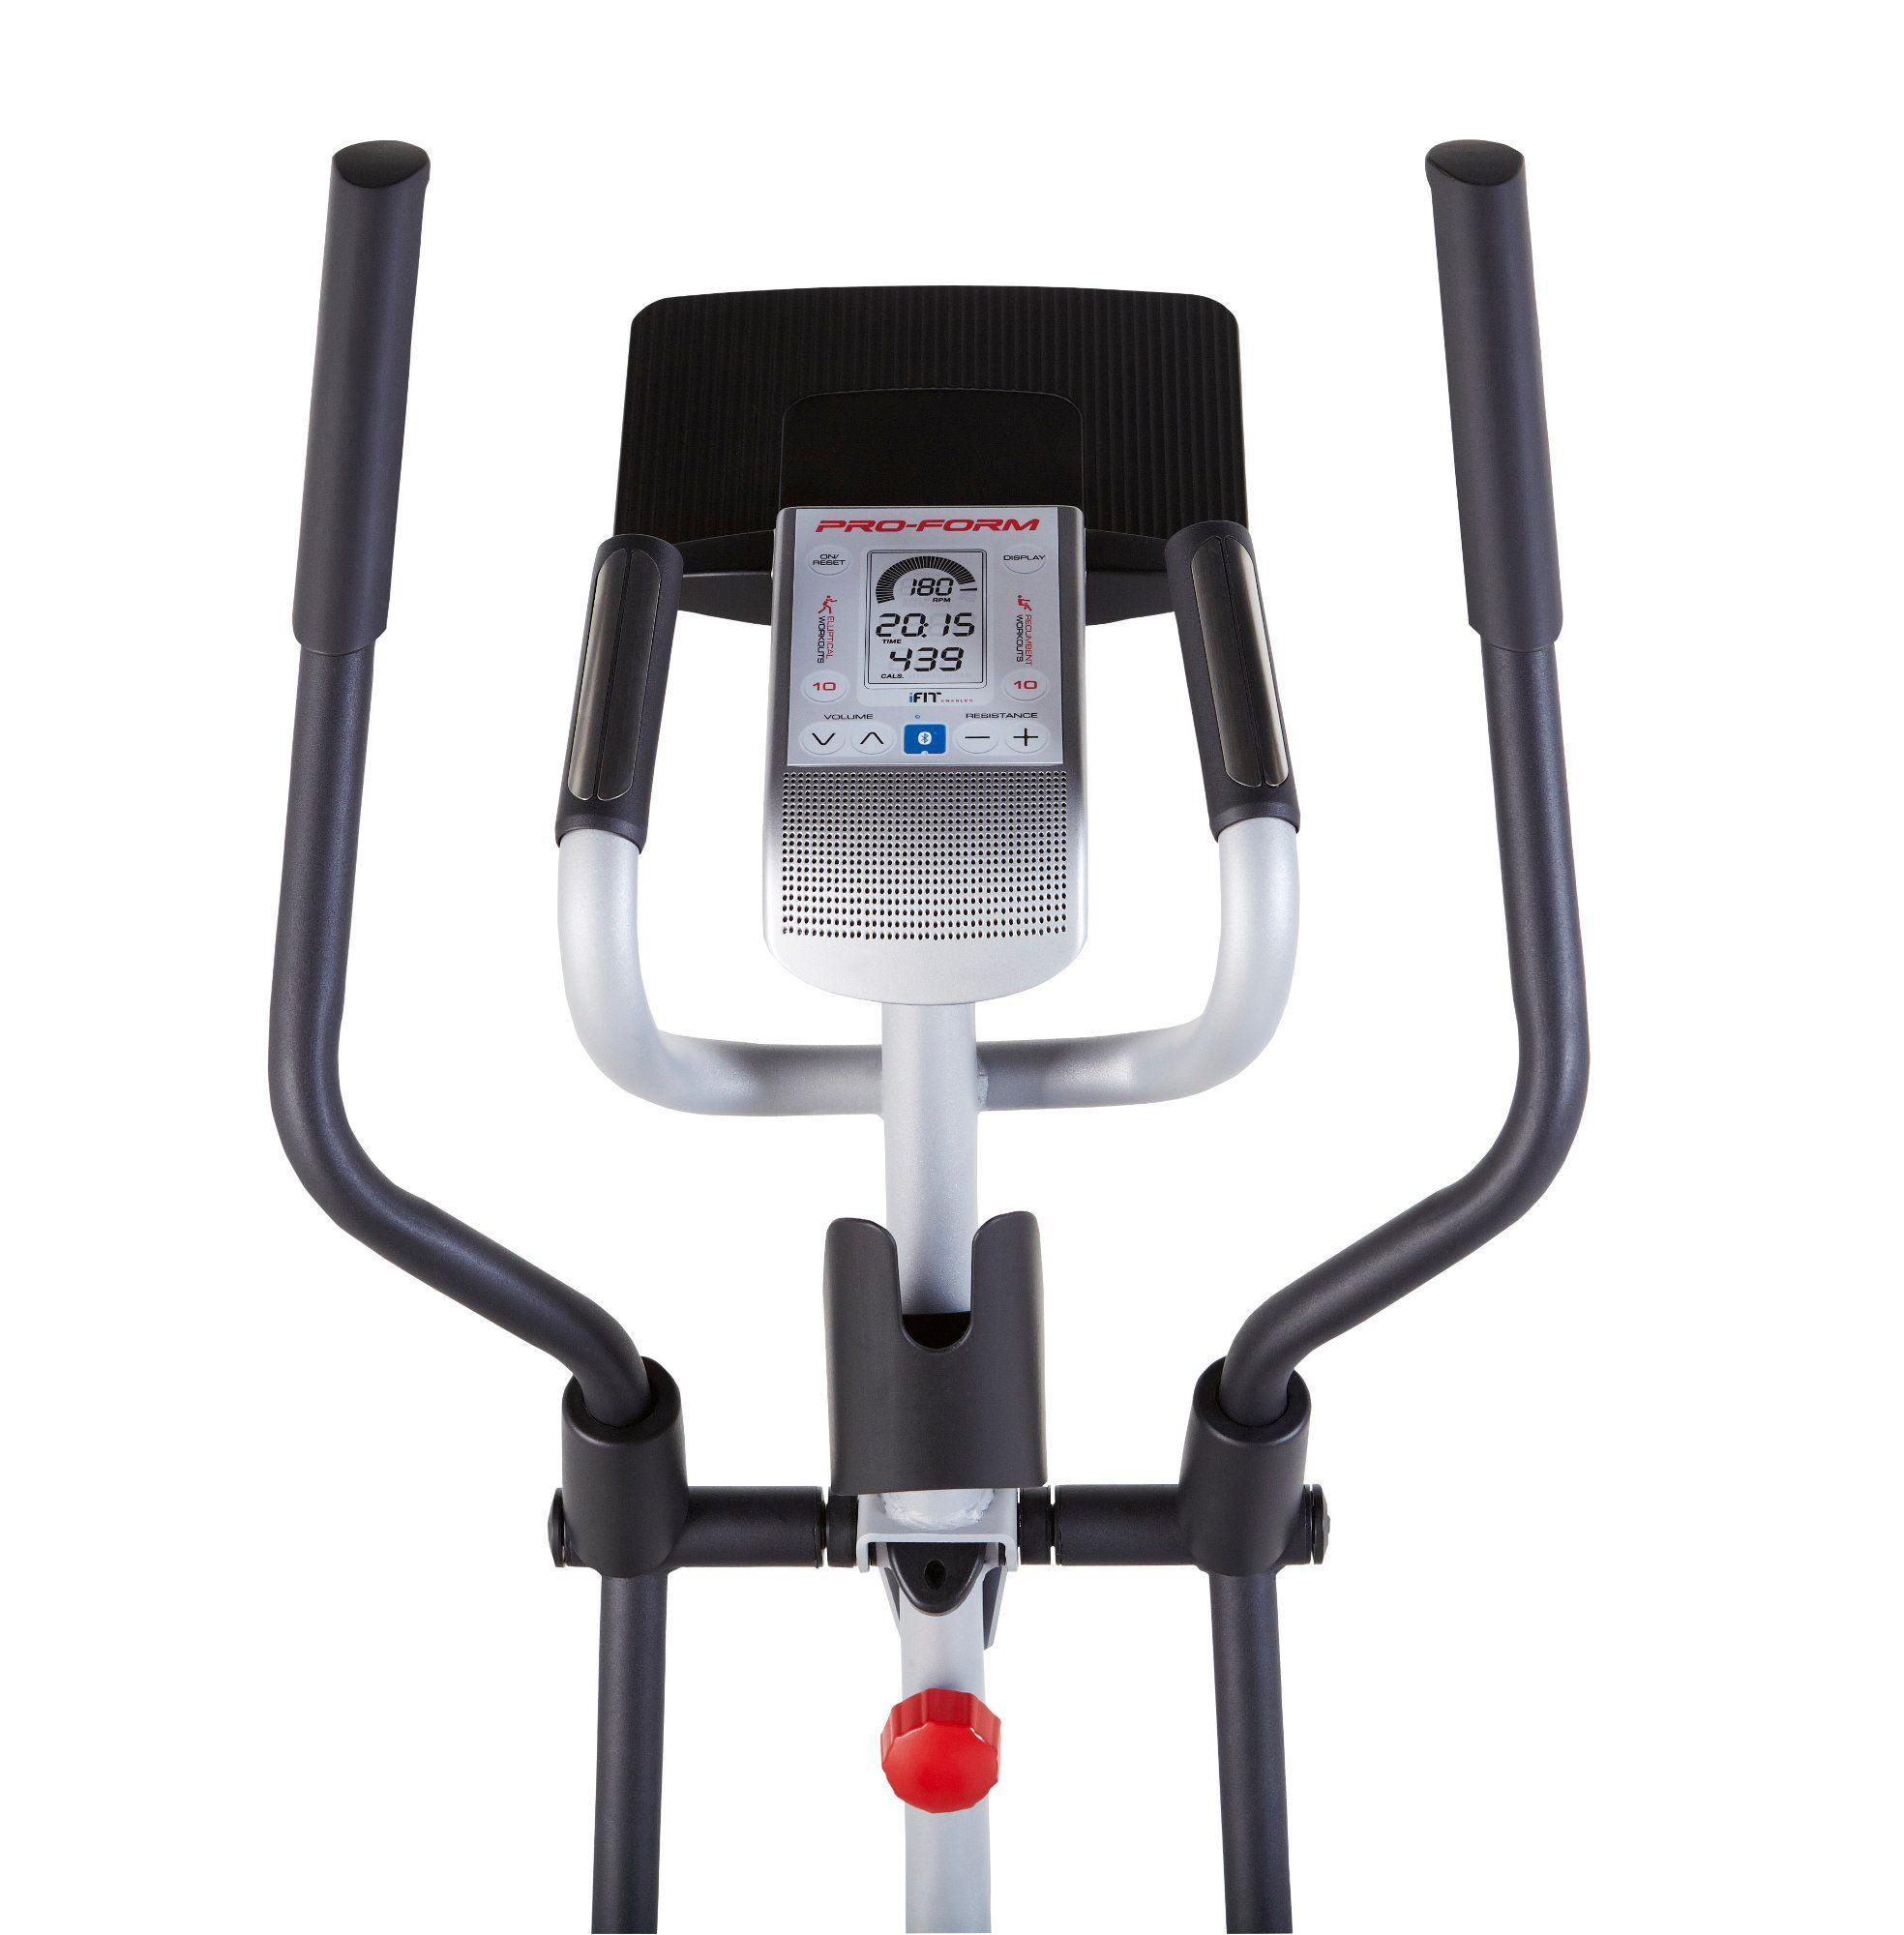 Proform Hybrid Trainer Pro Workout Apps Exercise Bikes